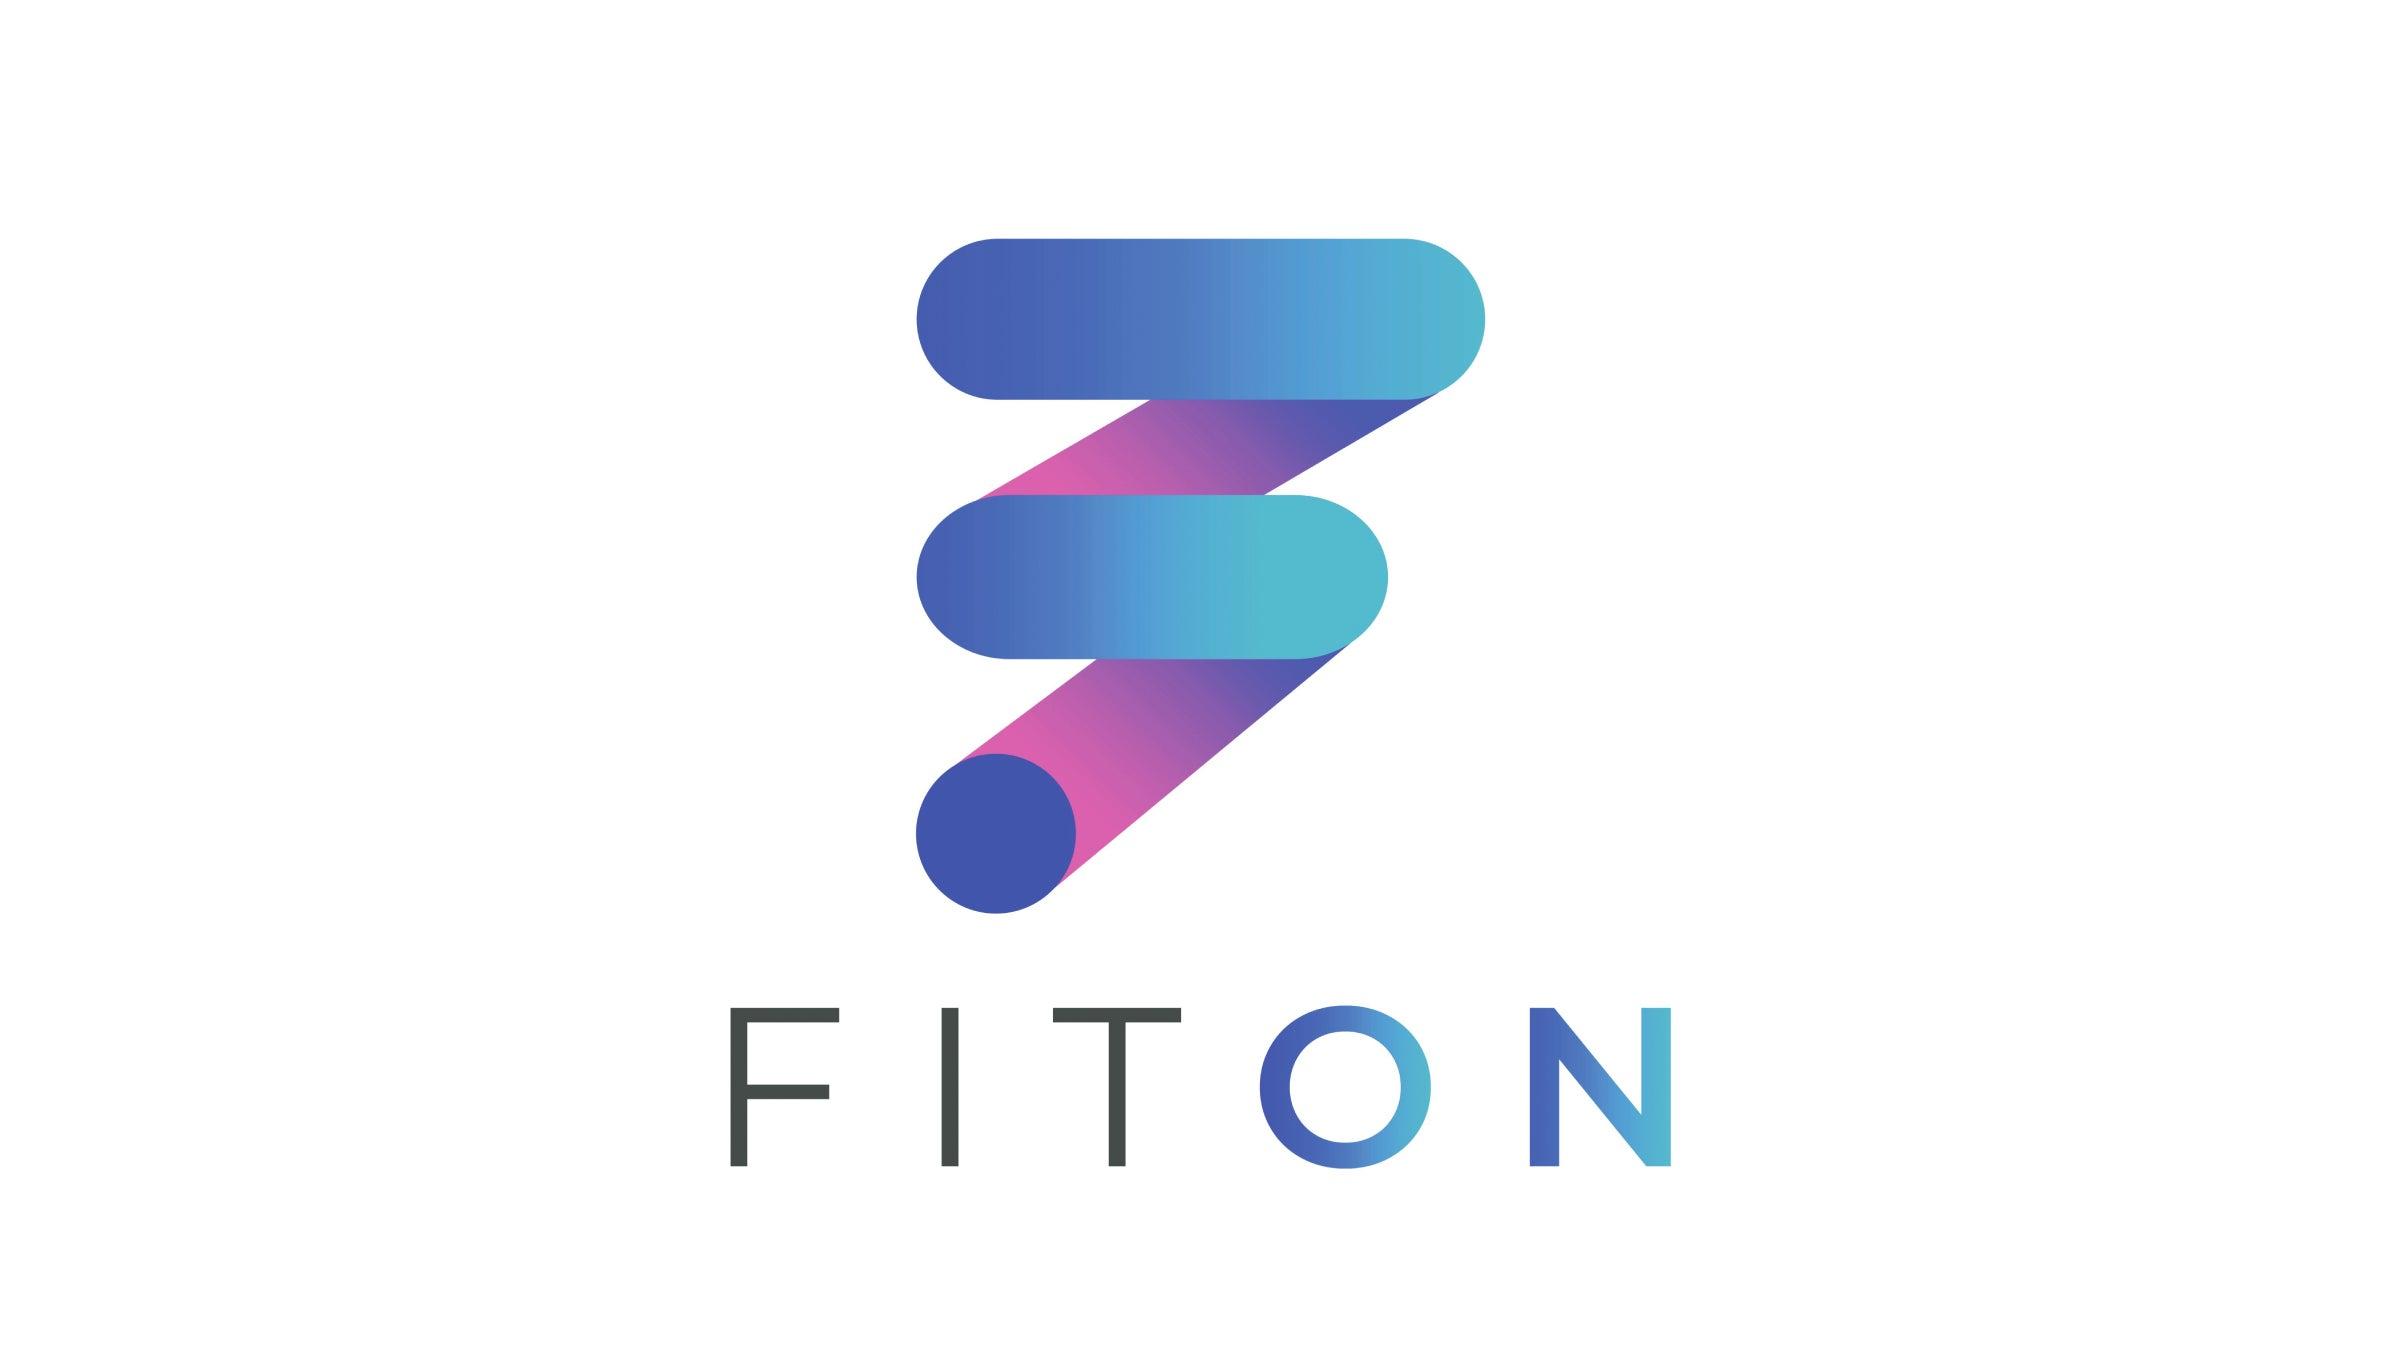 FitOn app tile